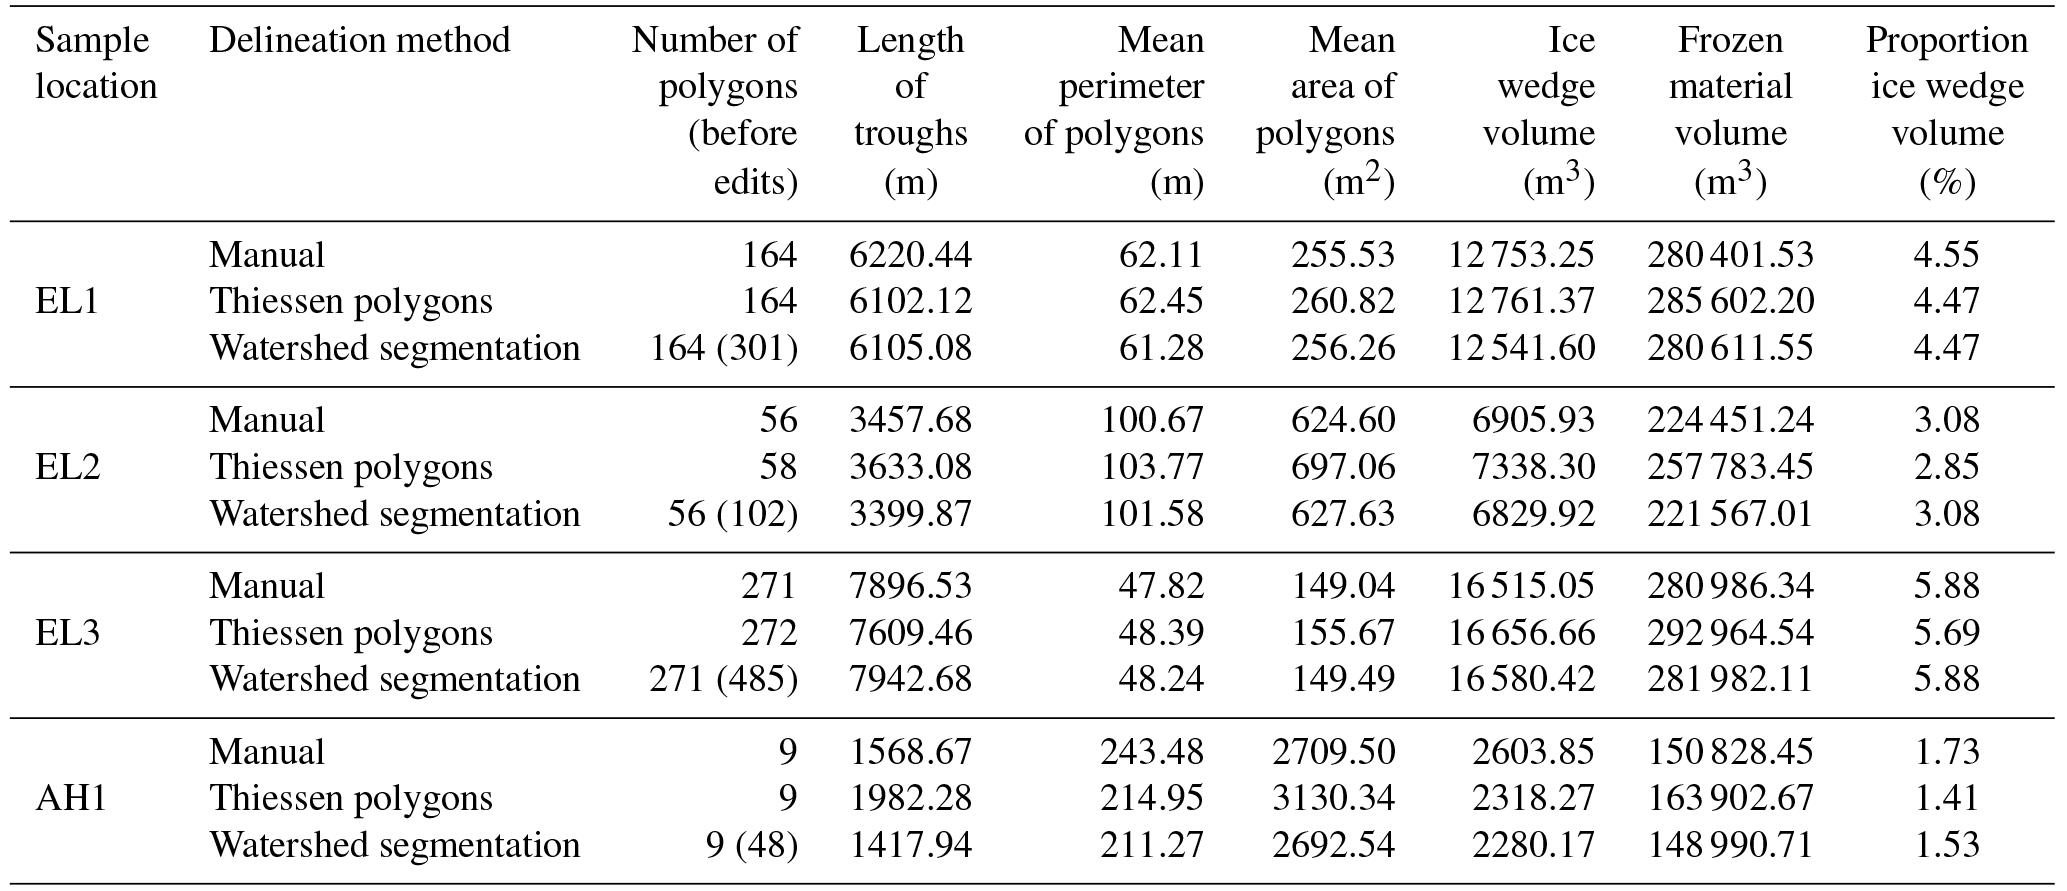 TC - An estimate of ice wedge volume for a High Arctic polar desert